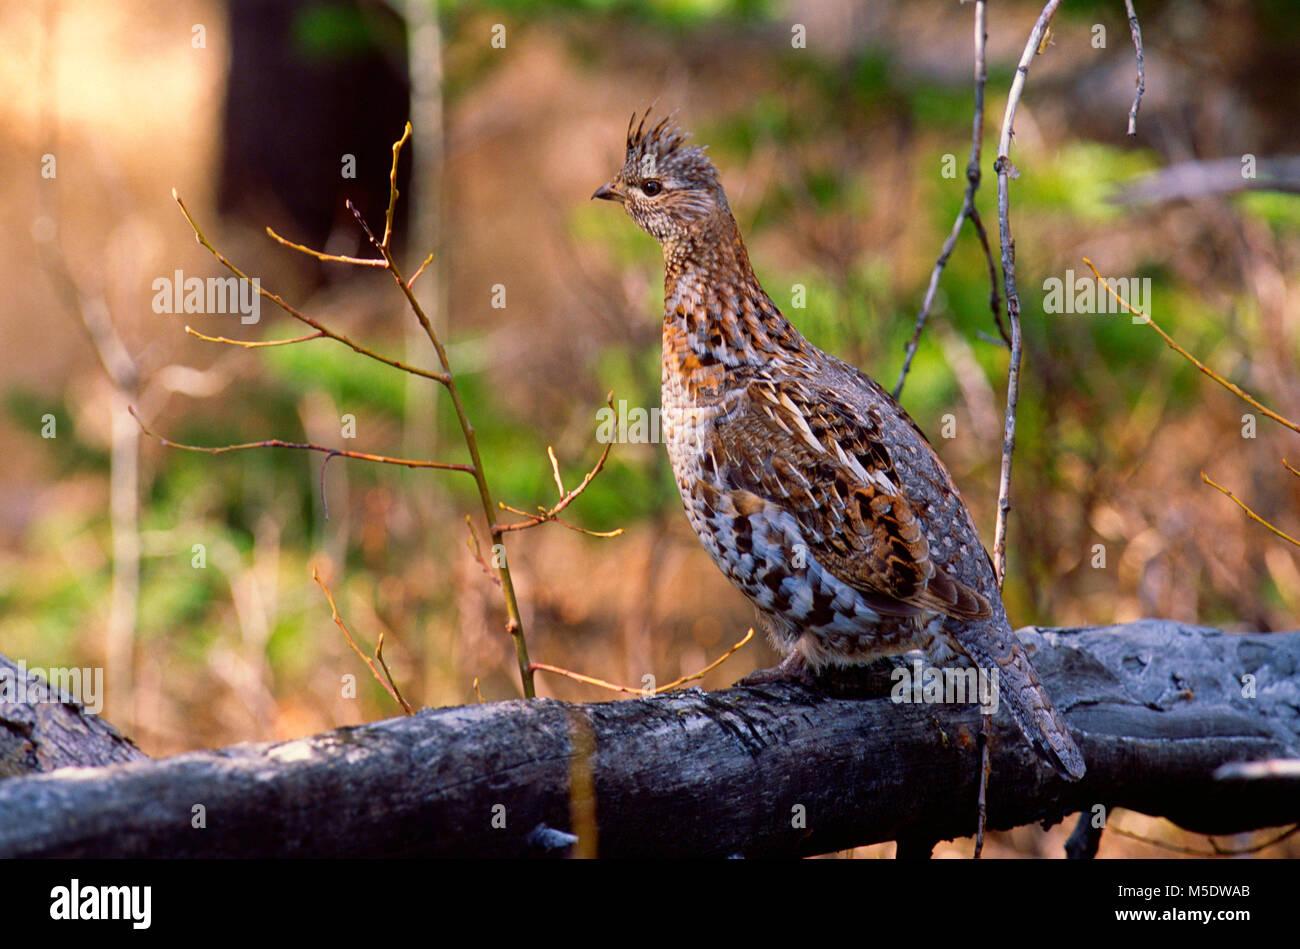 Ruffed Grouse, Bonasa umbellus, Phasianidae, Grouse, bird, animal, Jasper National Park, Alberta, Canada - Stock Image